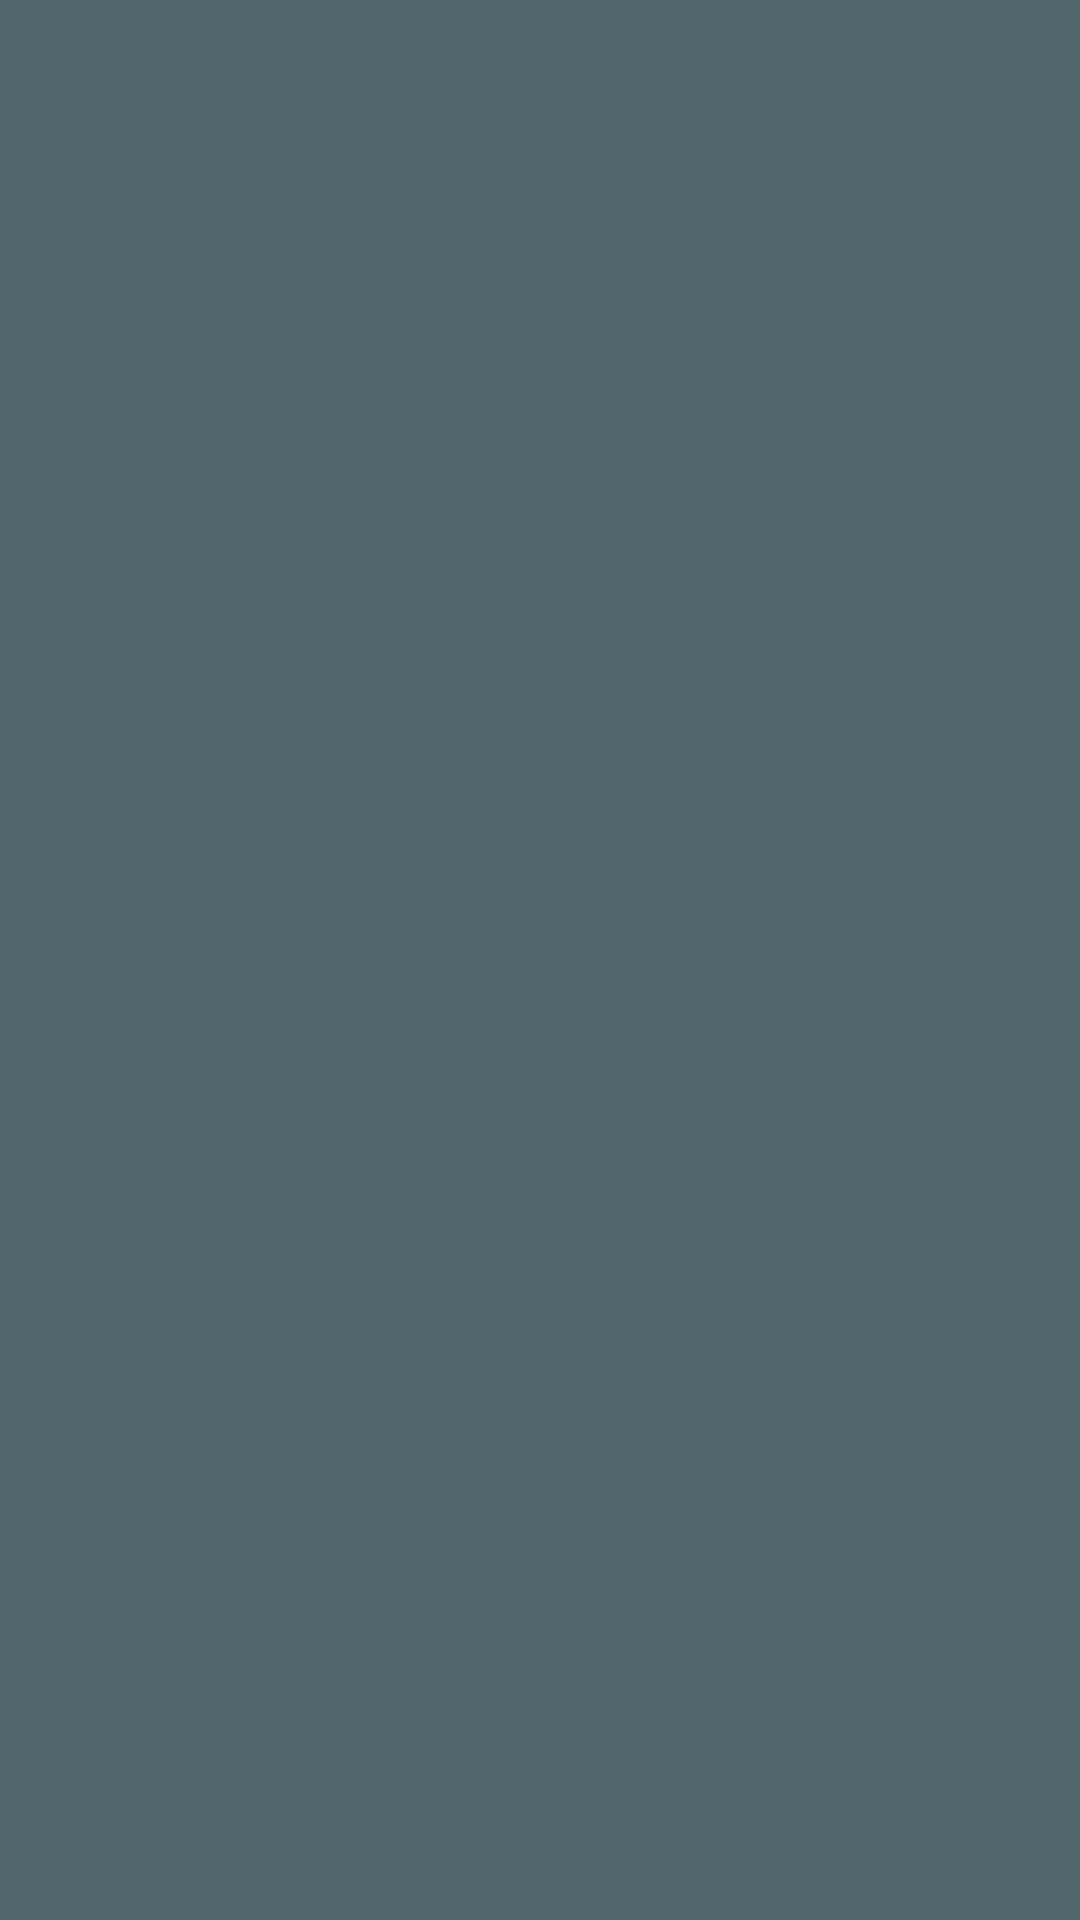 1080x1920 Stormcloud Solid Color Background